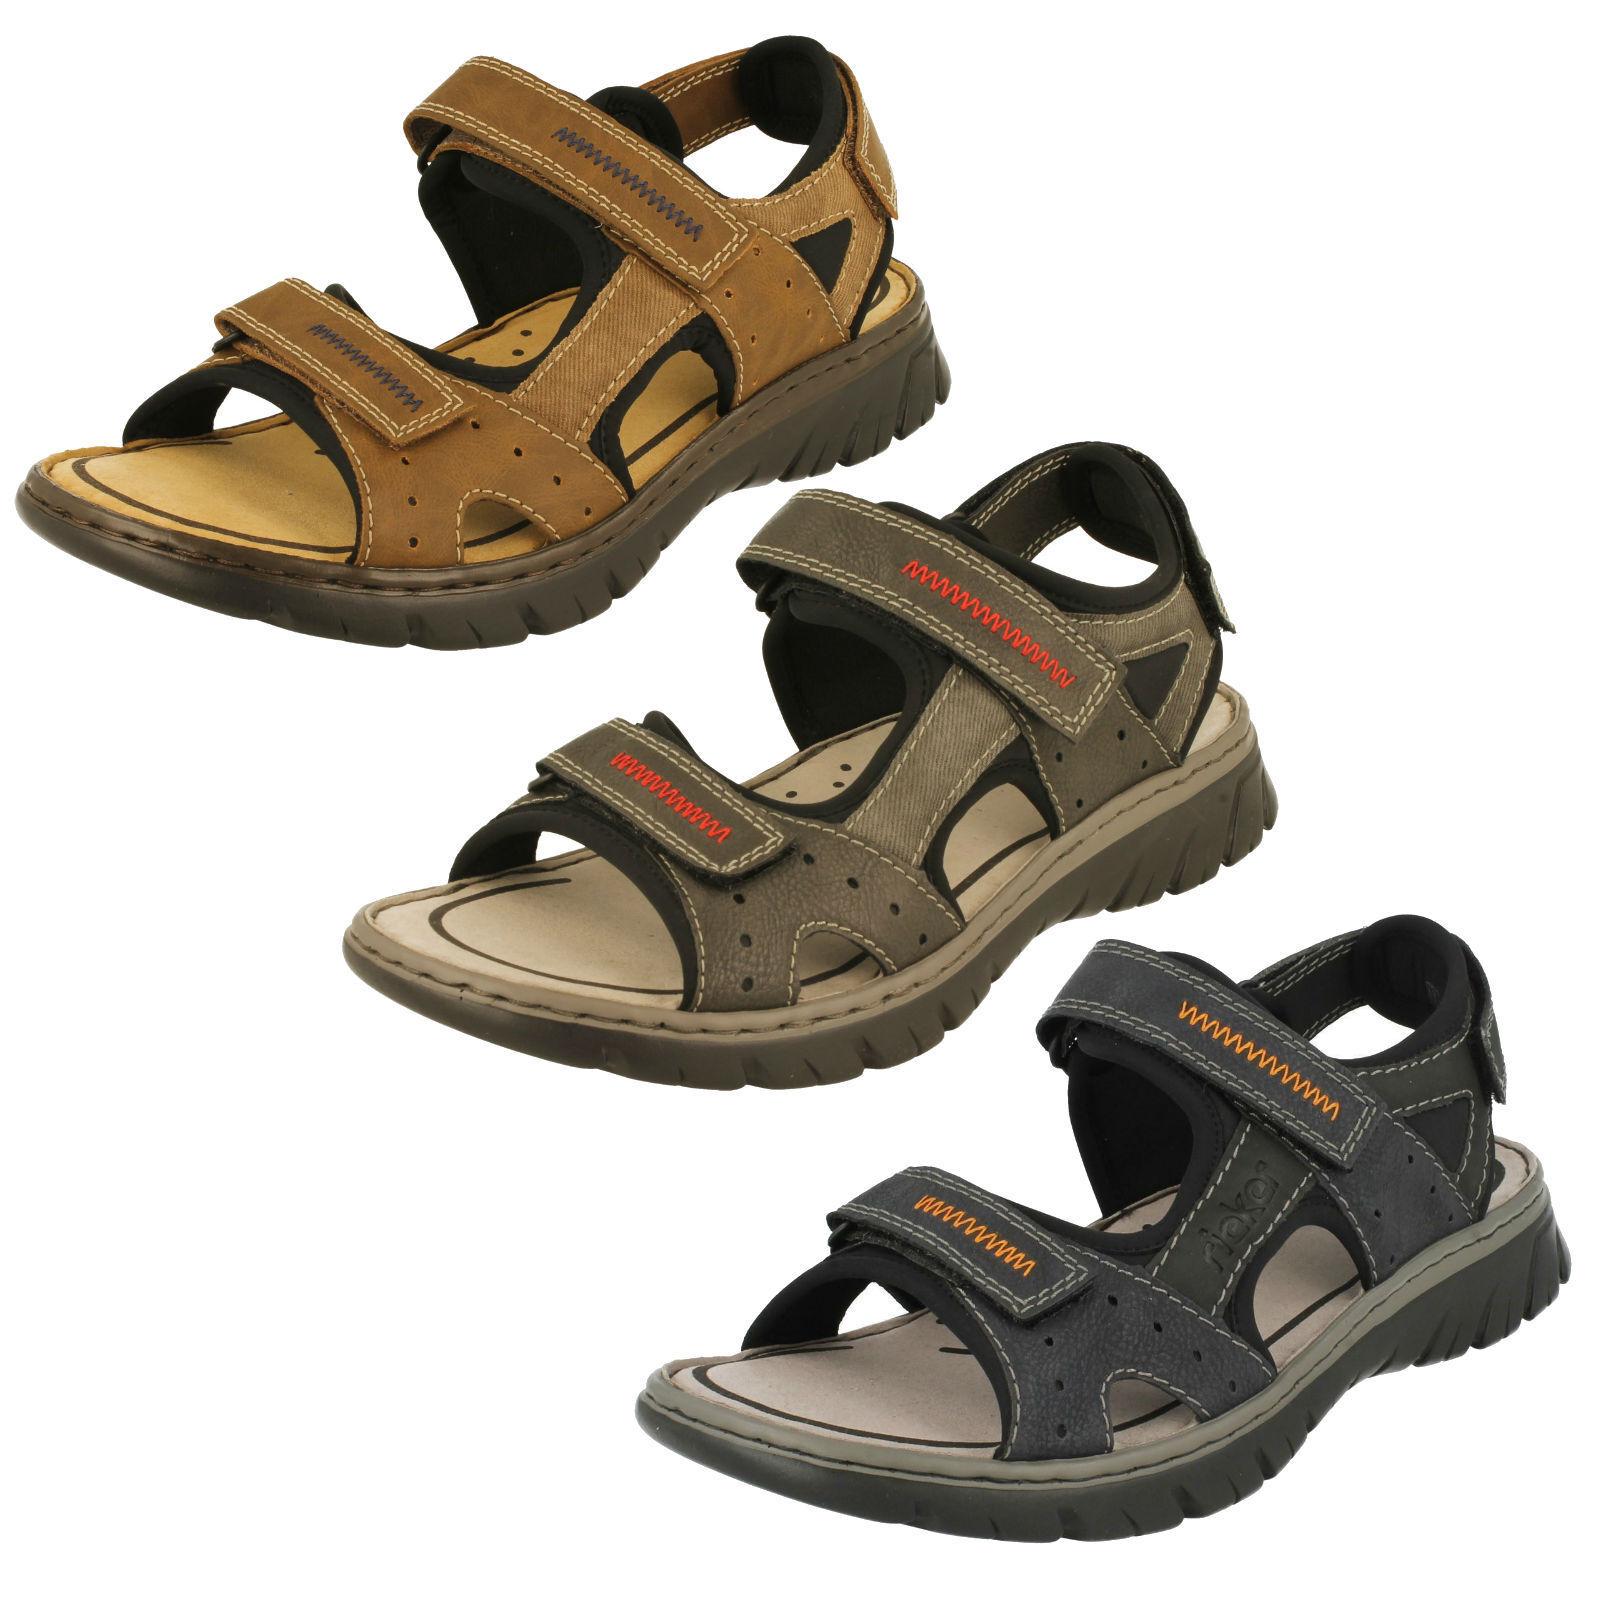 Men's Rieker Sandals - 26757